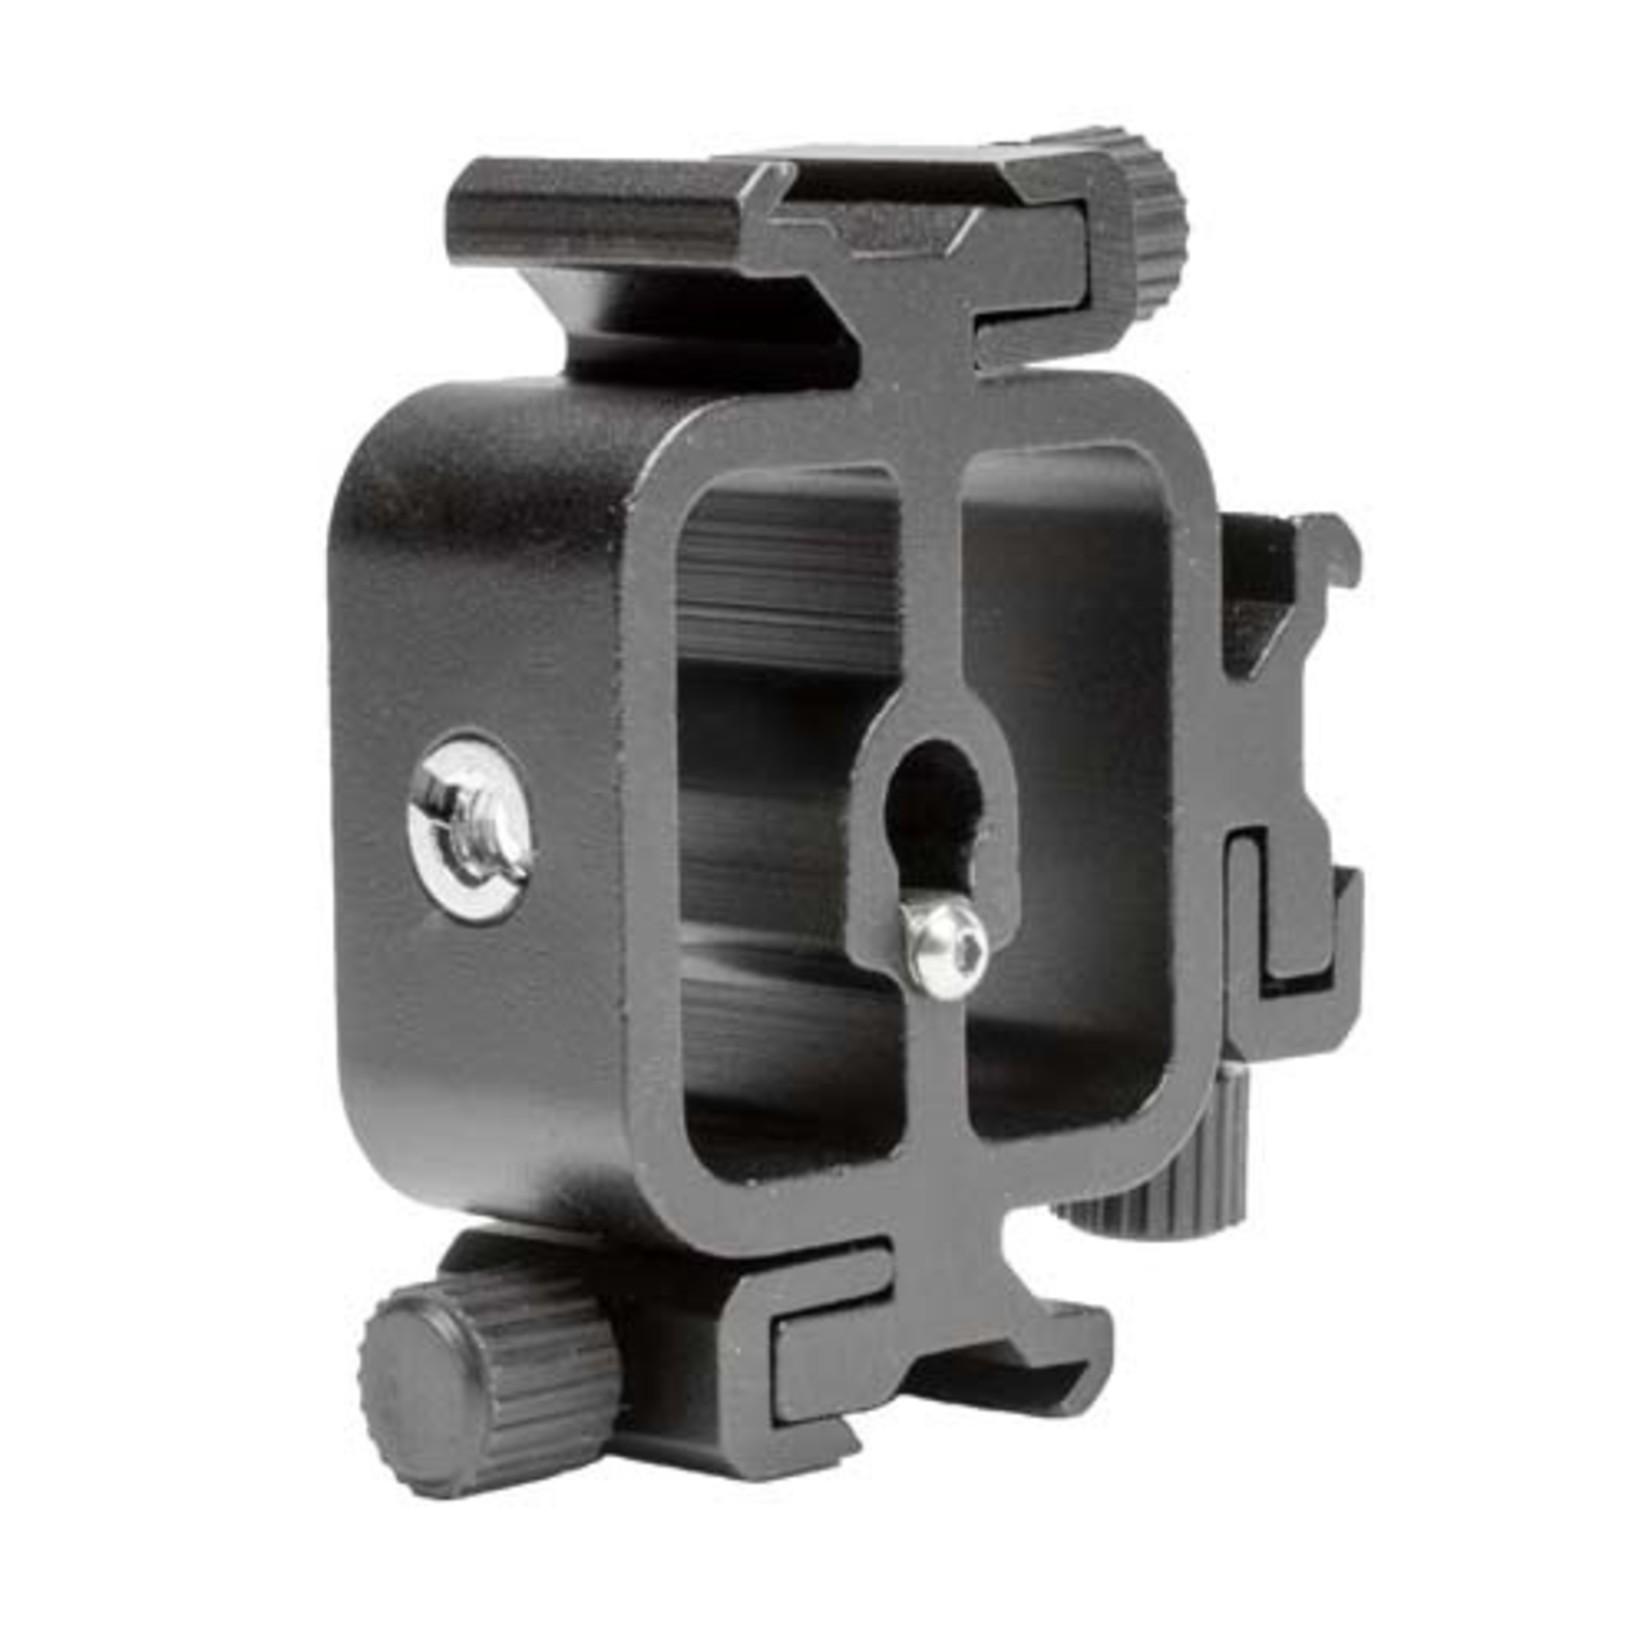 ProMaster Triple Shoe Flash Mount Adapter